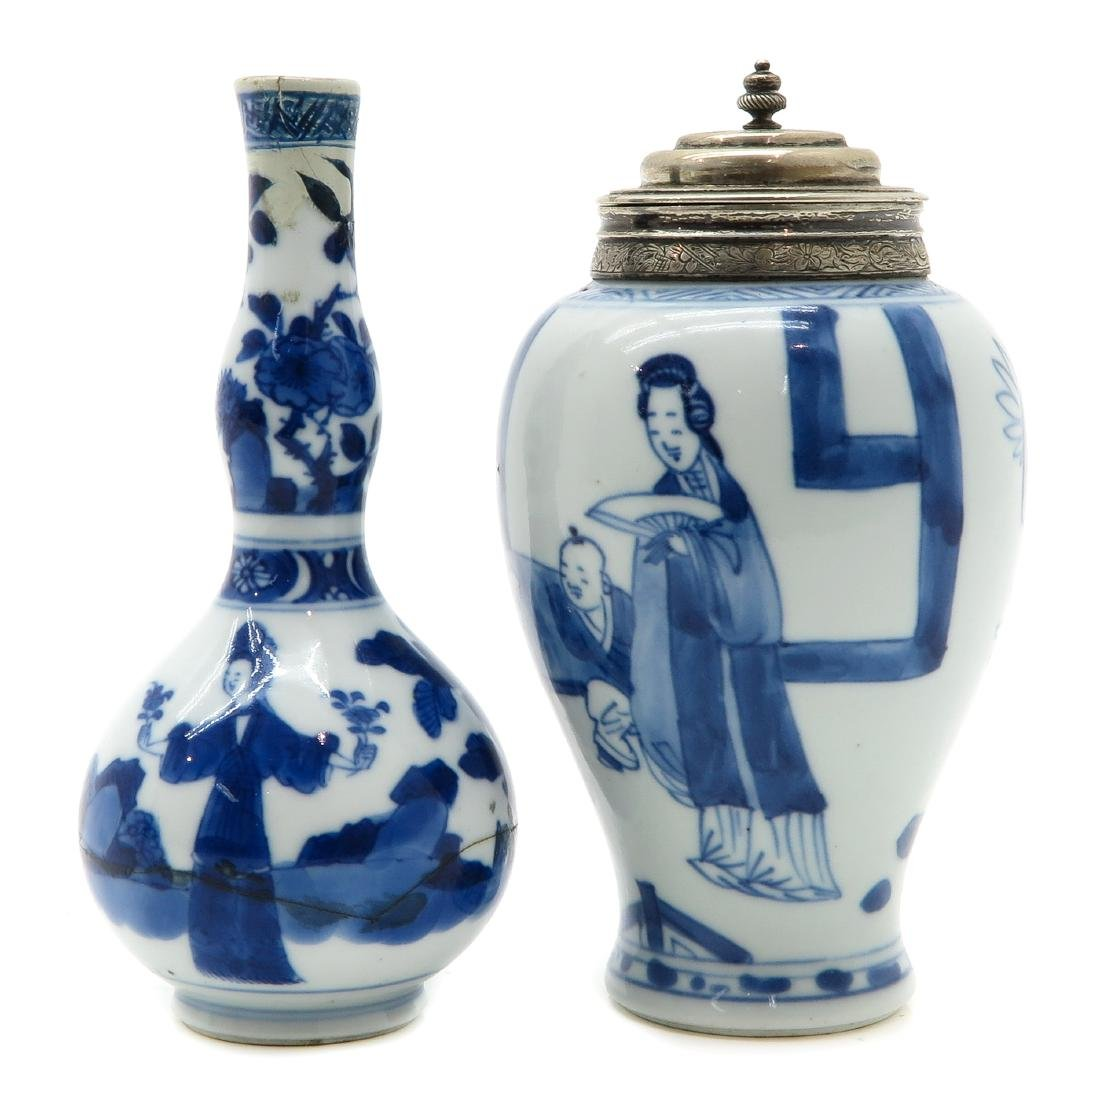 Vase and Tea Box